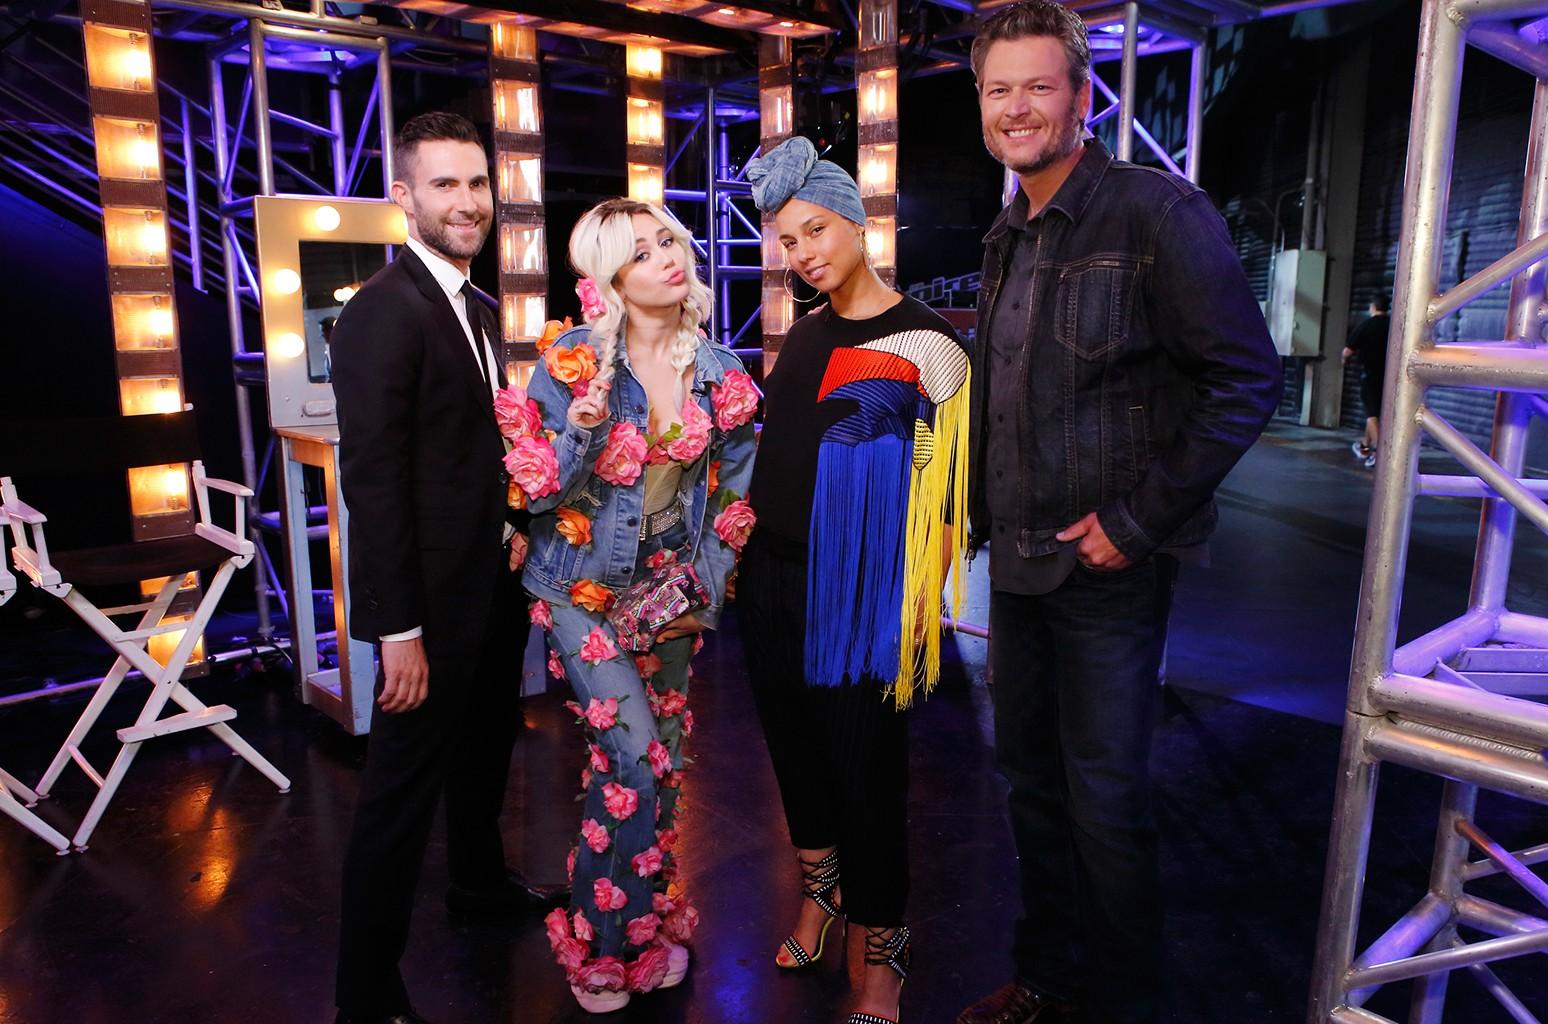 Adam Levine, Miley Cyrus, Alicia Keys and Blake Shelton on The Voice.